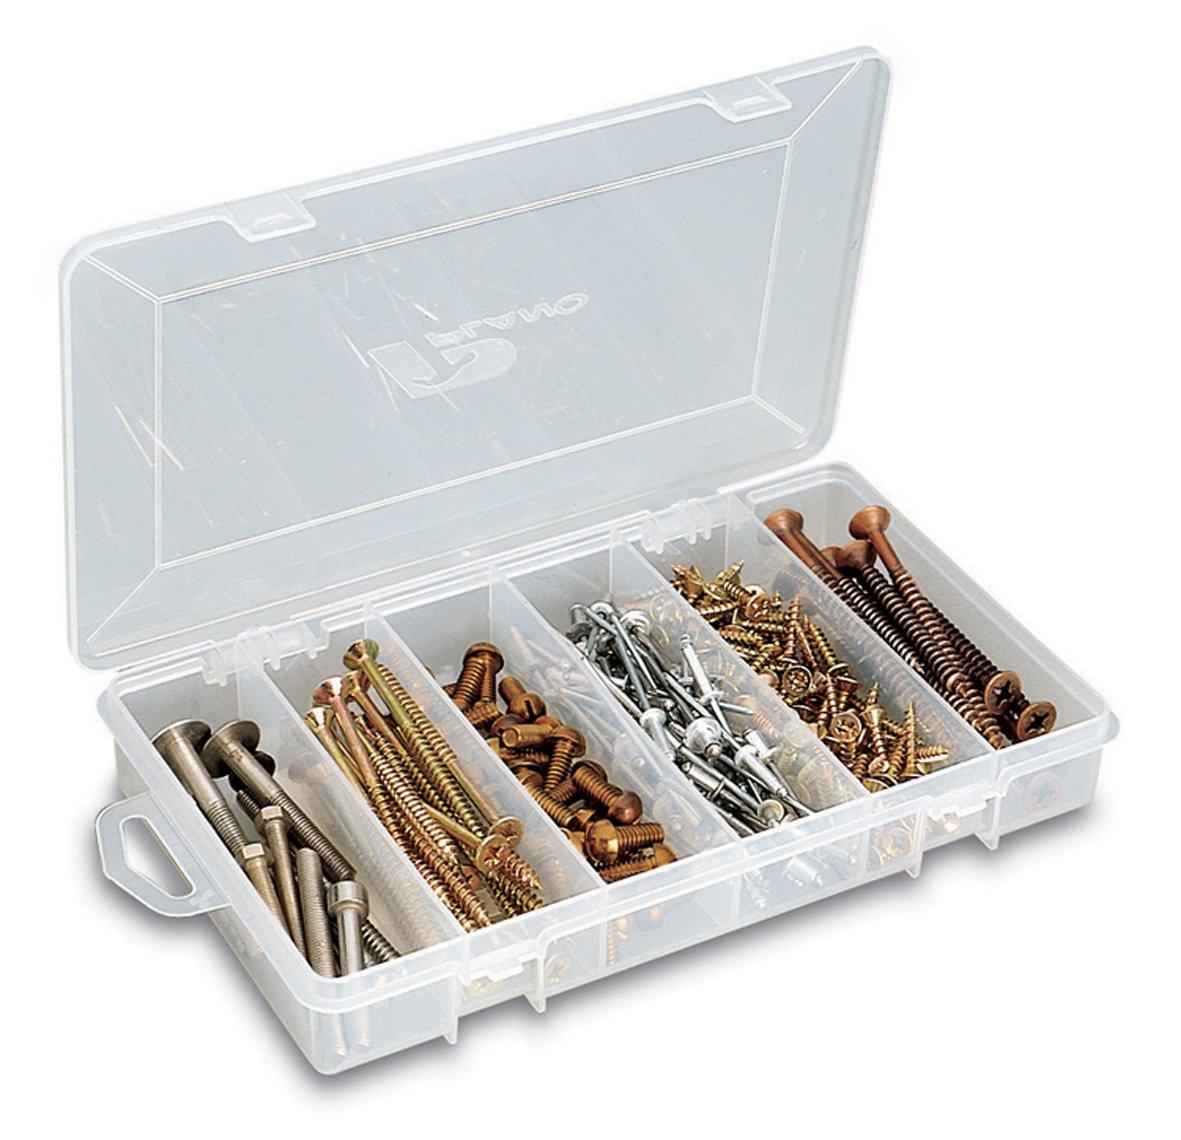 Plano 34501TT 3450 Transparent Polypropylene Small Parts Organiser